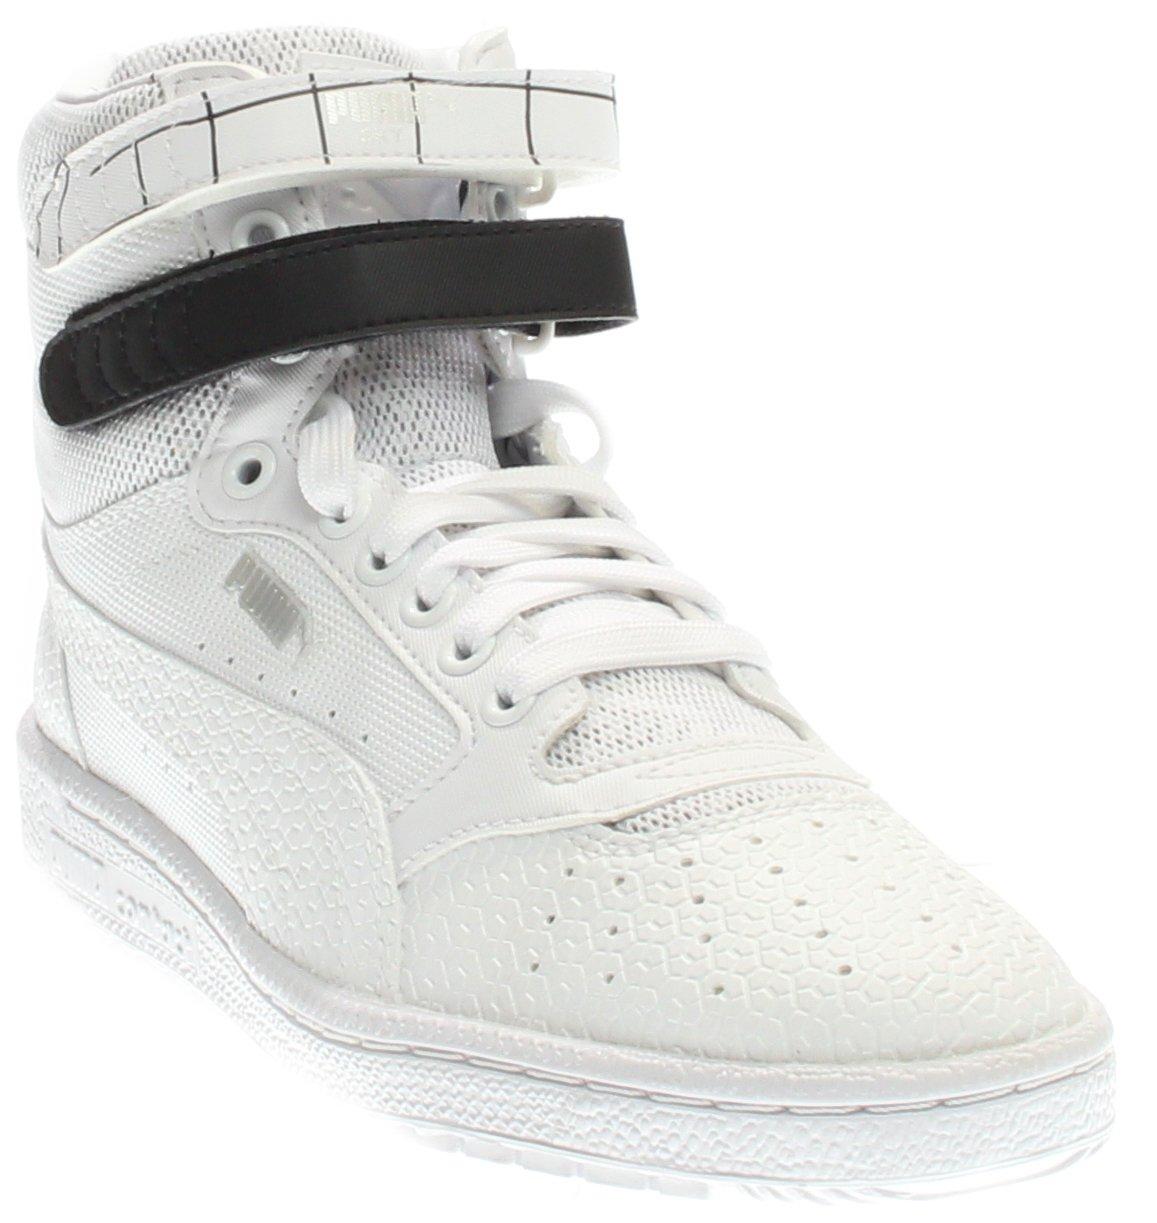 PUMA Women's Sky Ii Hi Sf Texture WN's Basketball Shoe, White Black, 8.5 M US by PUMA (Image #1)